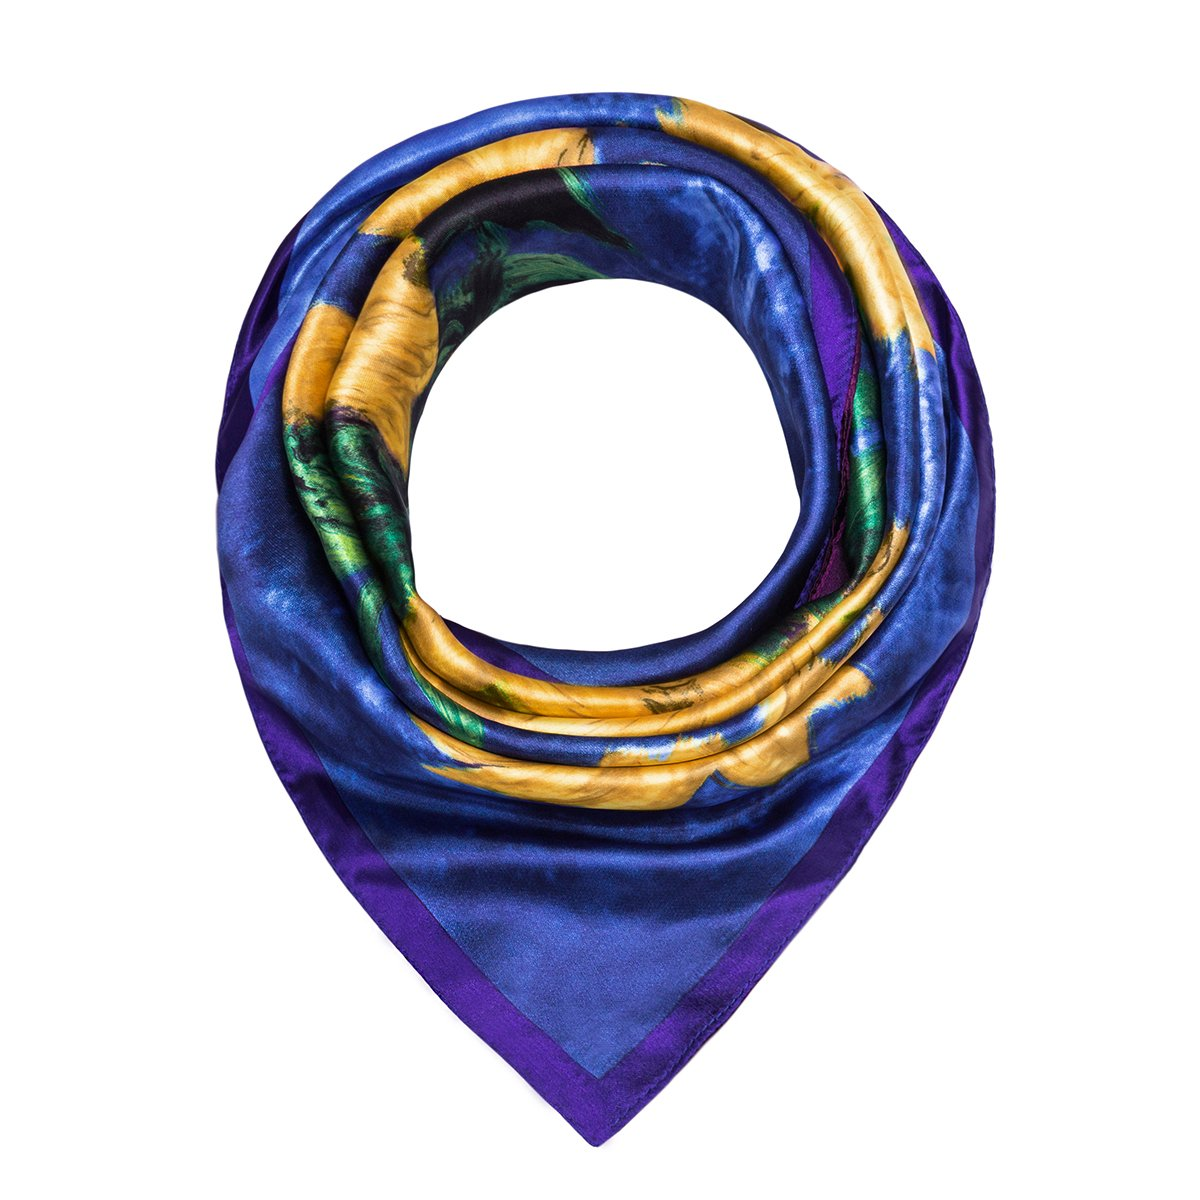 Flowomen Women\'s Silk Scarf colorful Square Large Neckerchief Daily Luxury Fashion Wrap (Dark Blue)